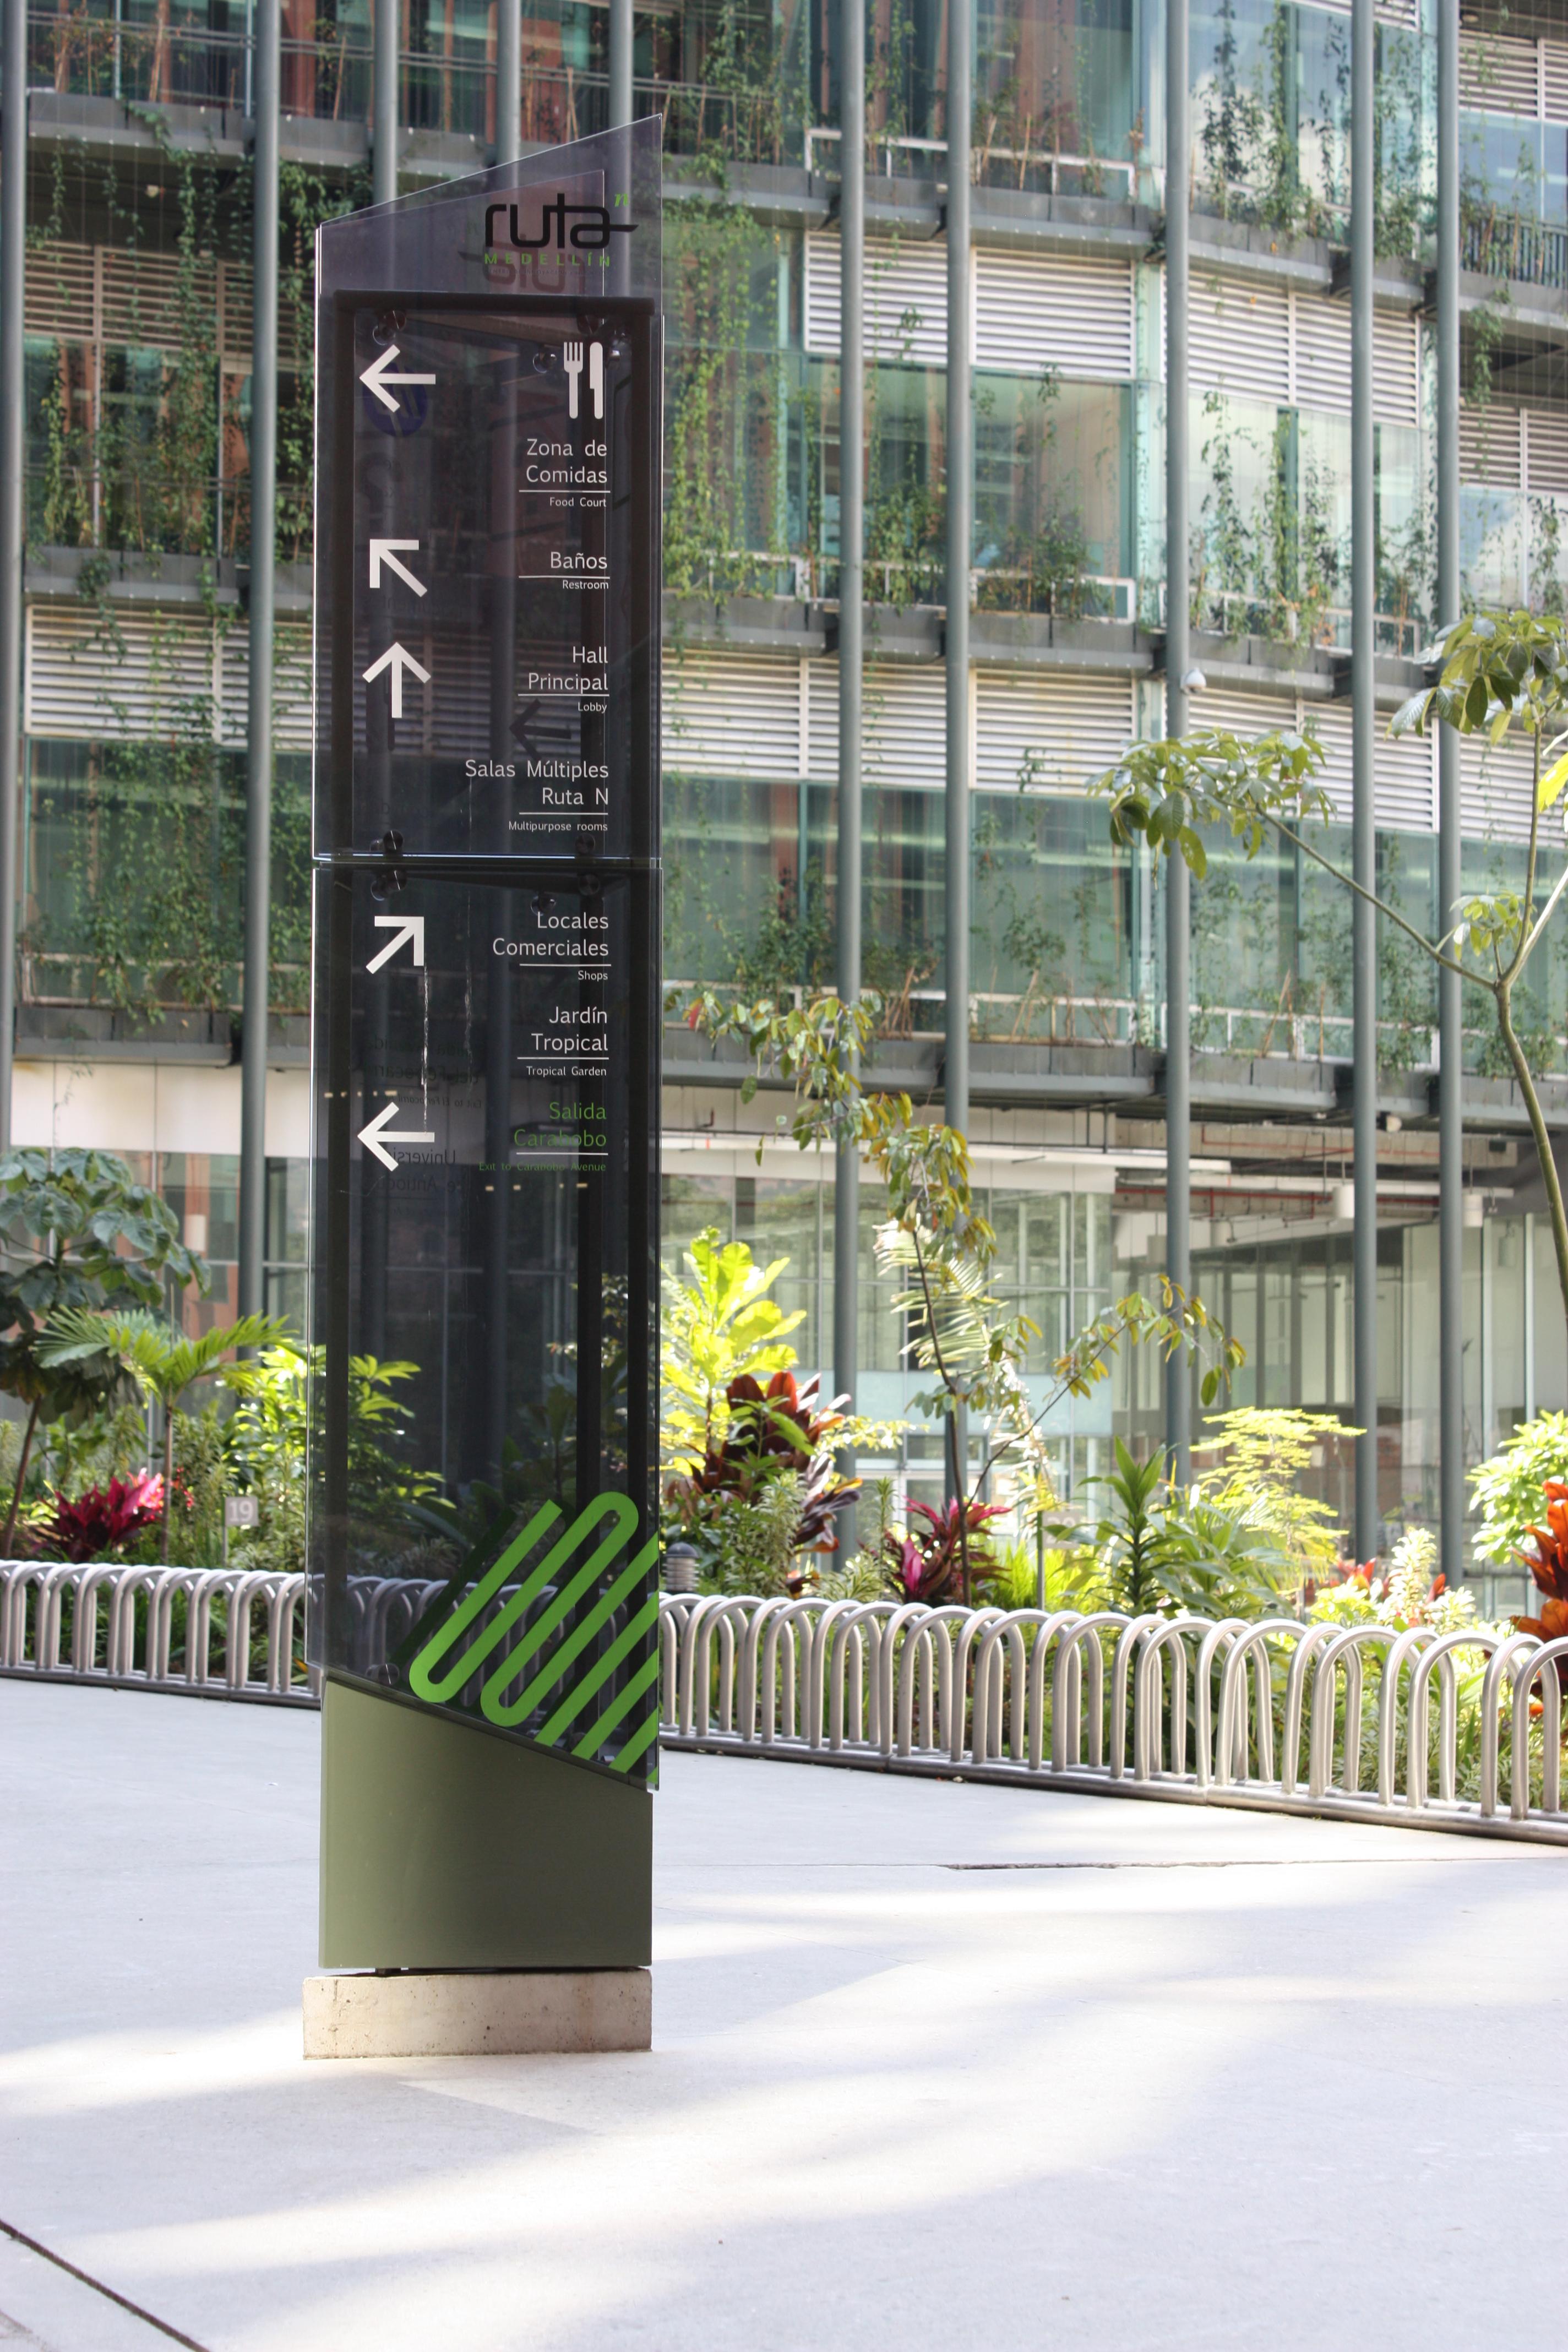 Ruta N 综合楼导视系统规划设计©eyemarca